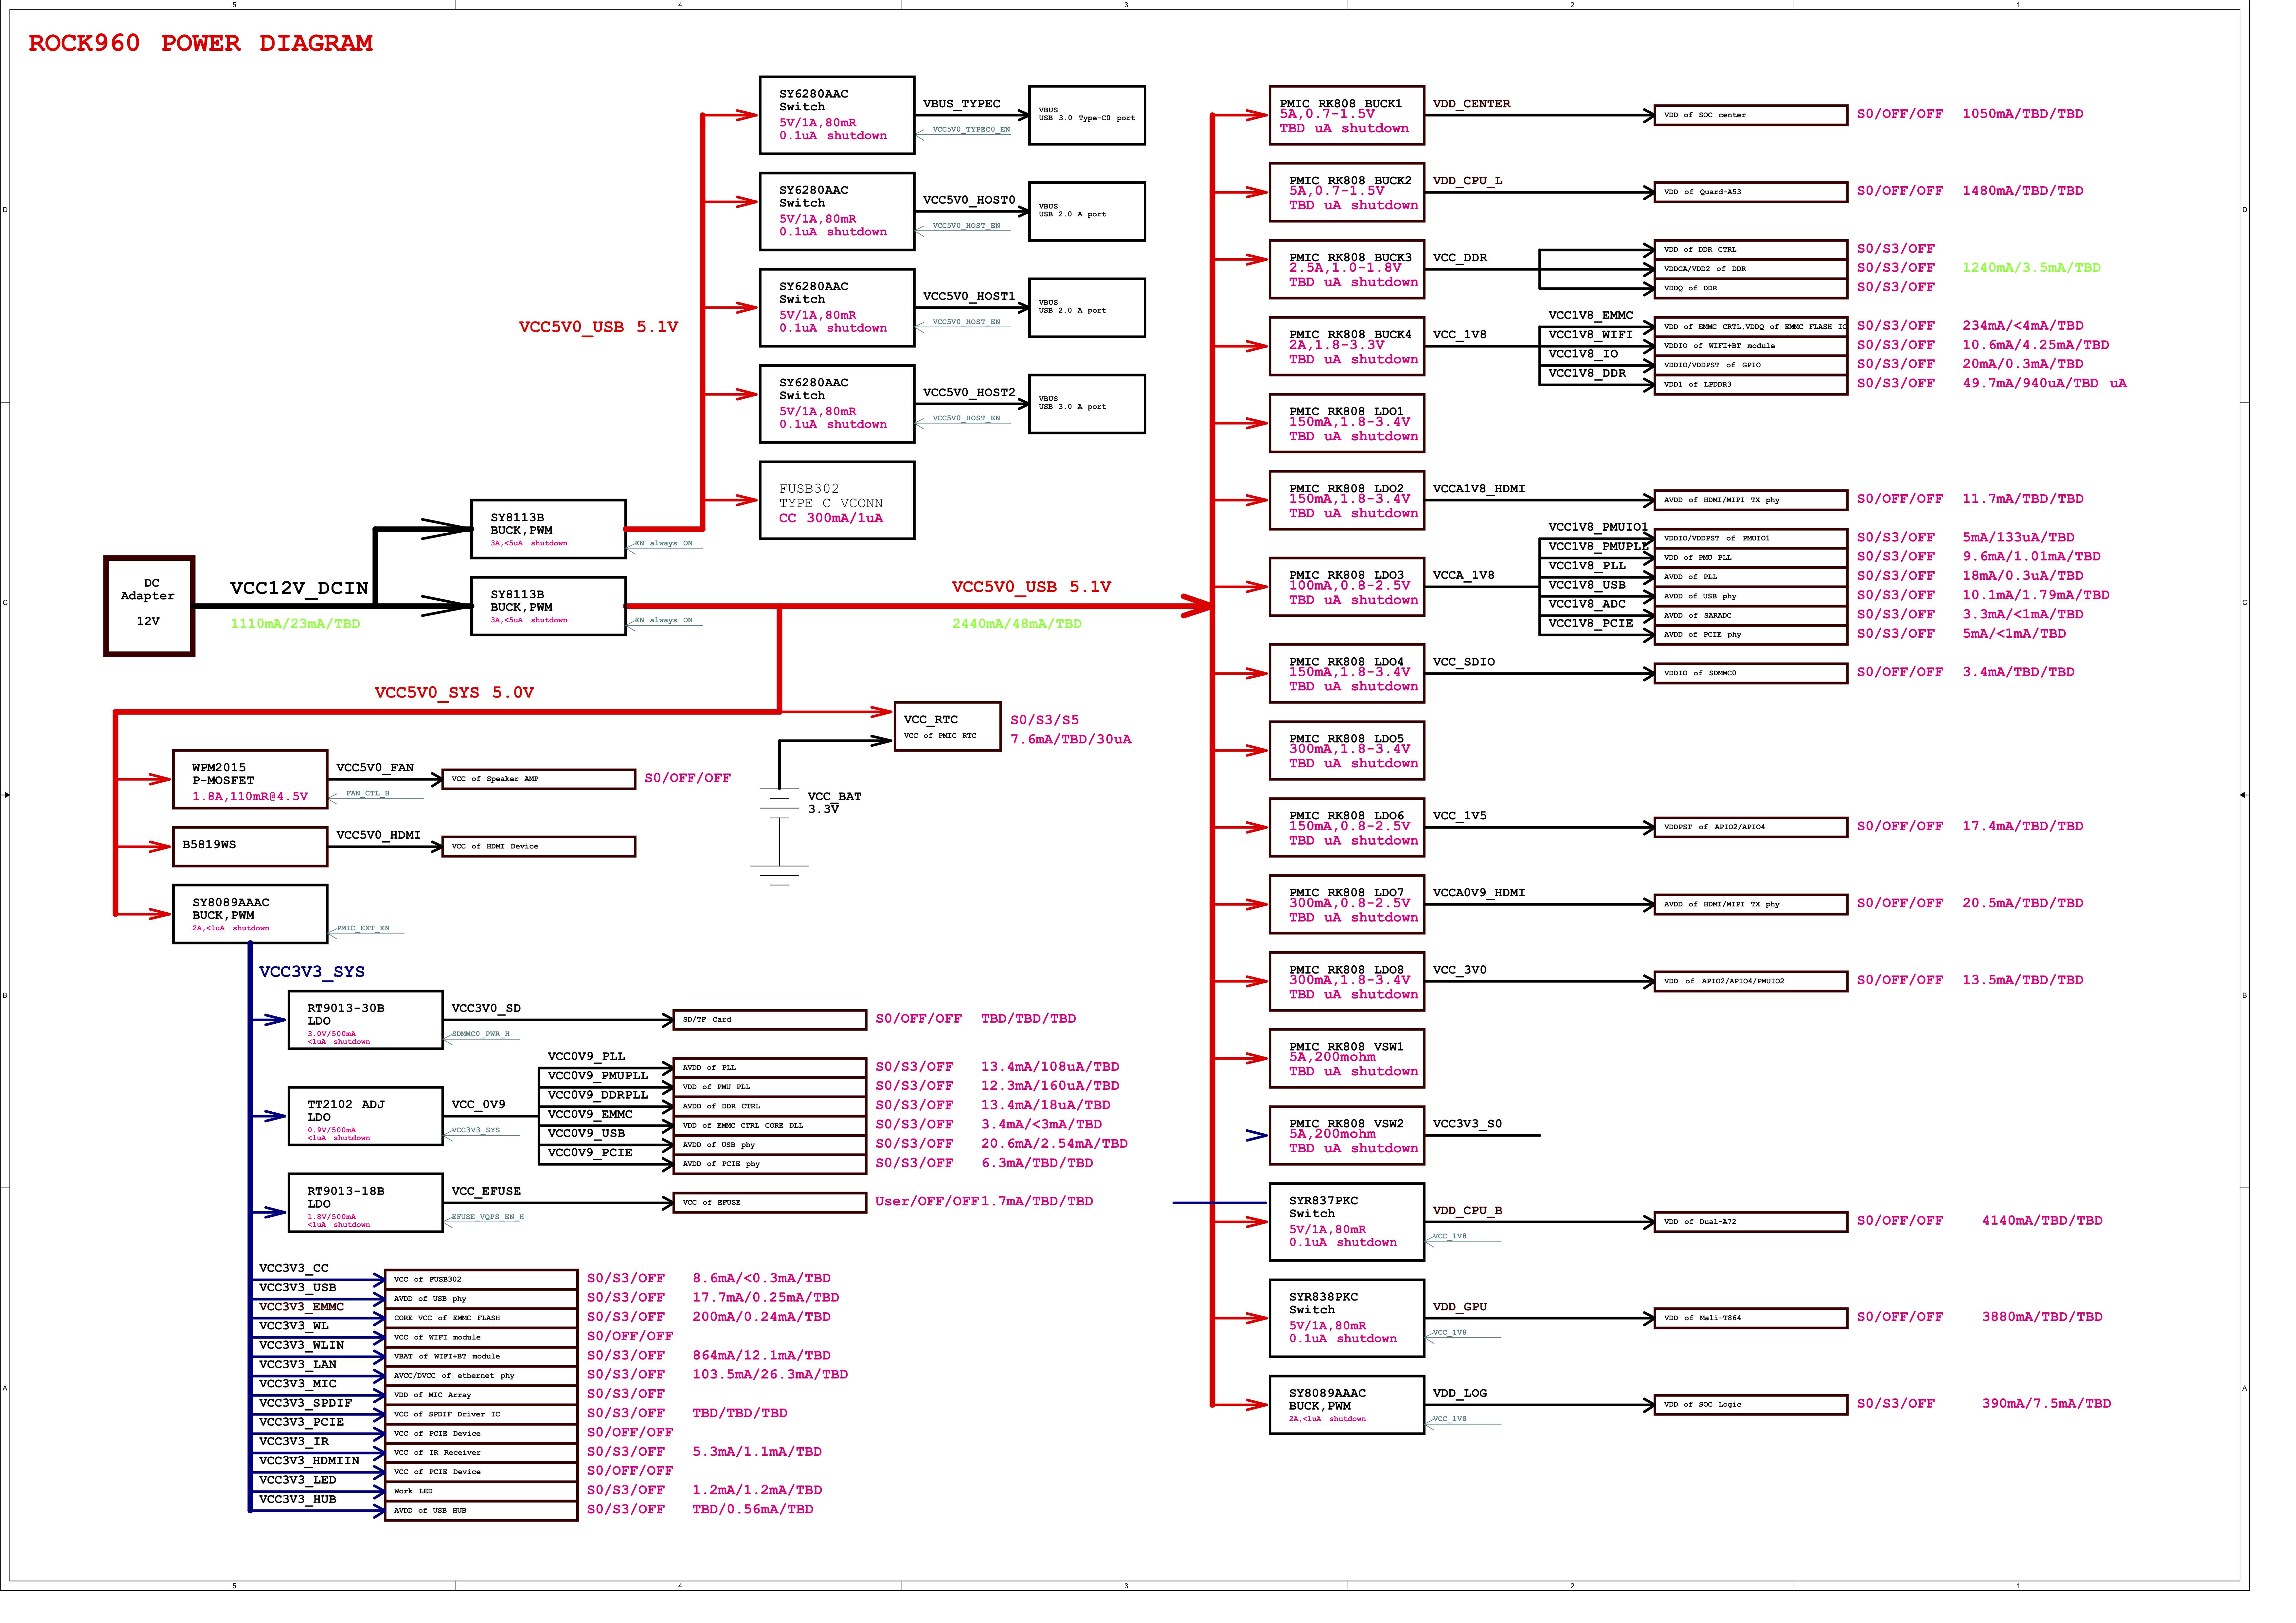 Hardware User Manual for ROCK960 - 96Boards